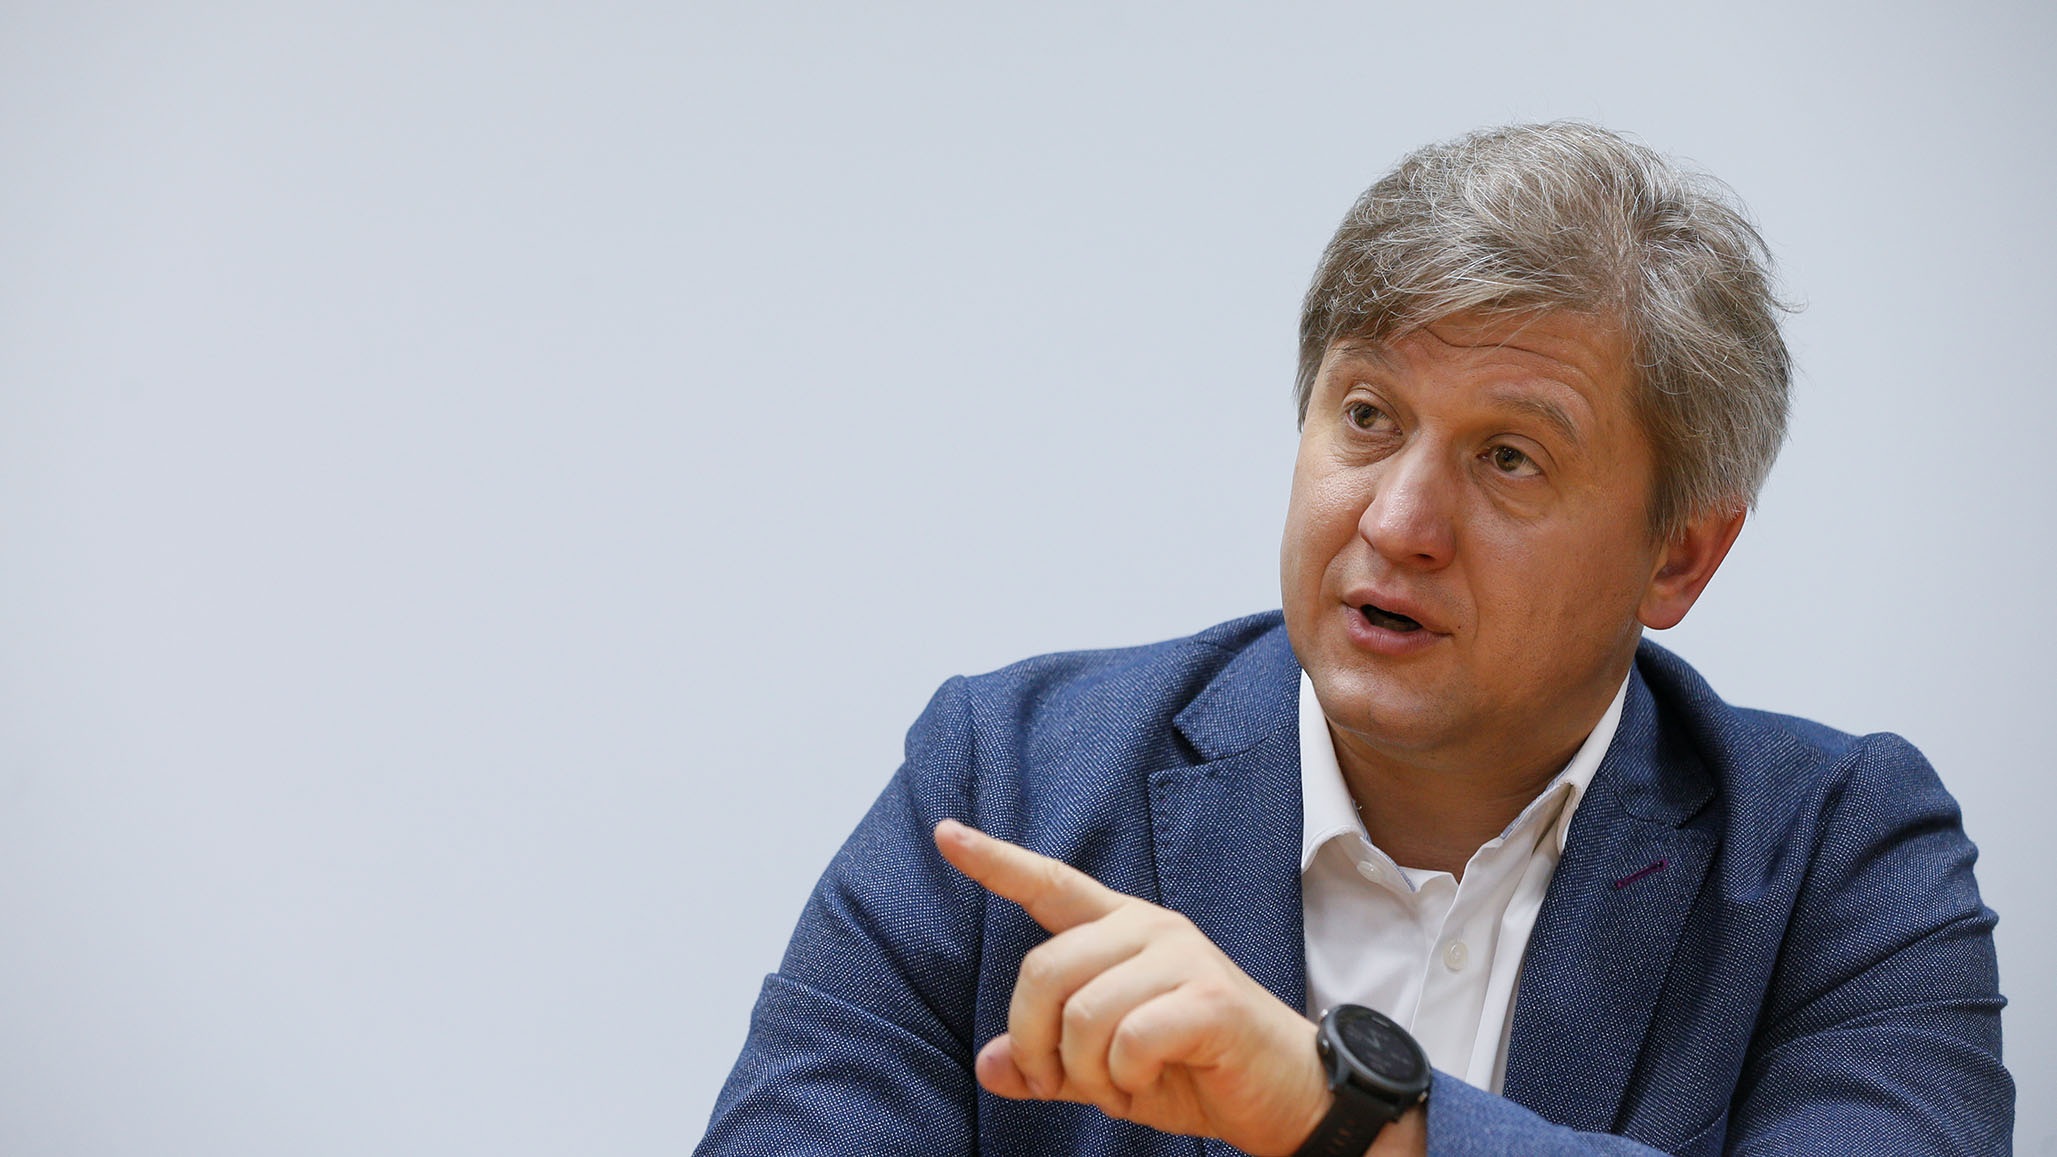 Former Zelensky Aide Says Trump Admin. Request for Investigations 'Rattled' Ukrainian President